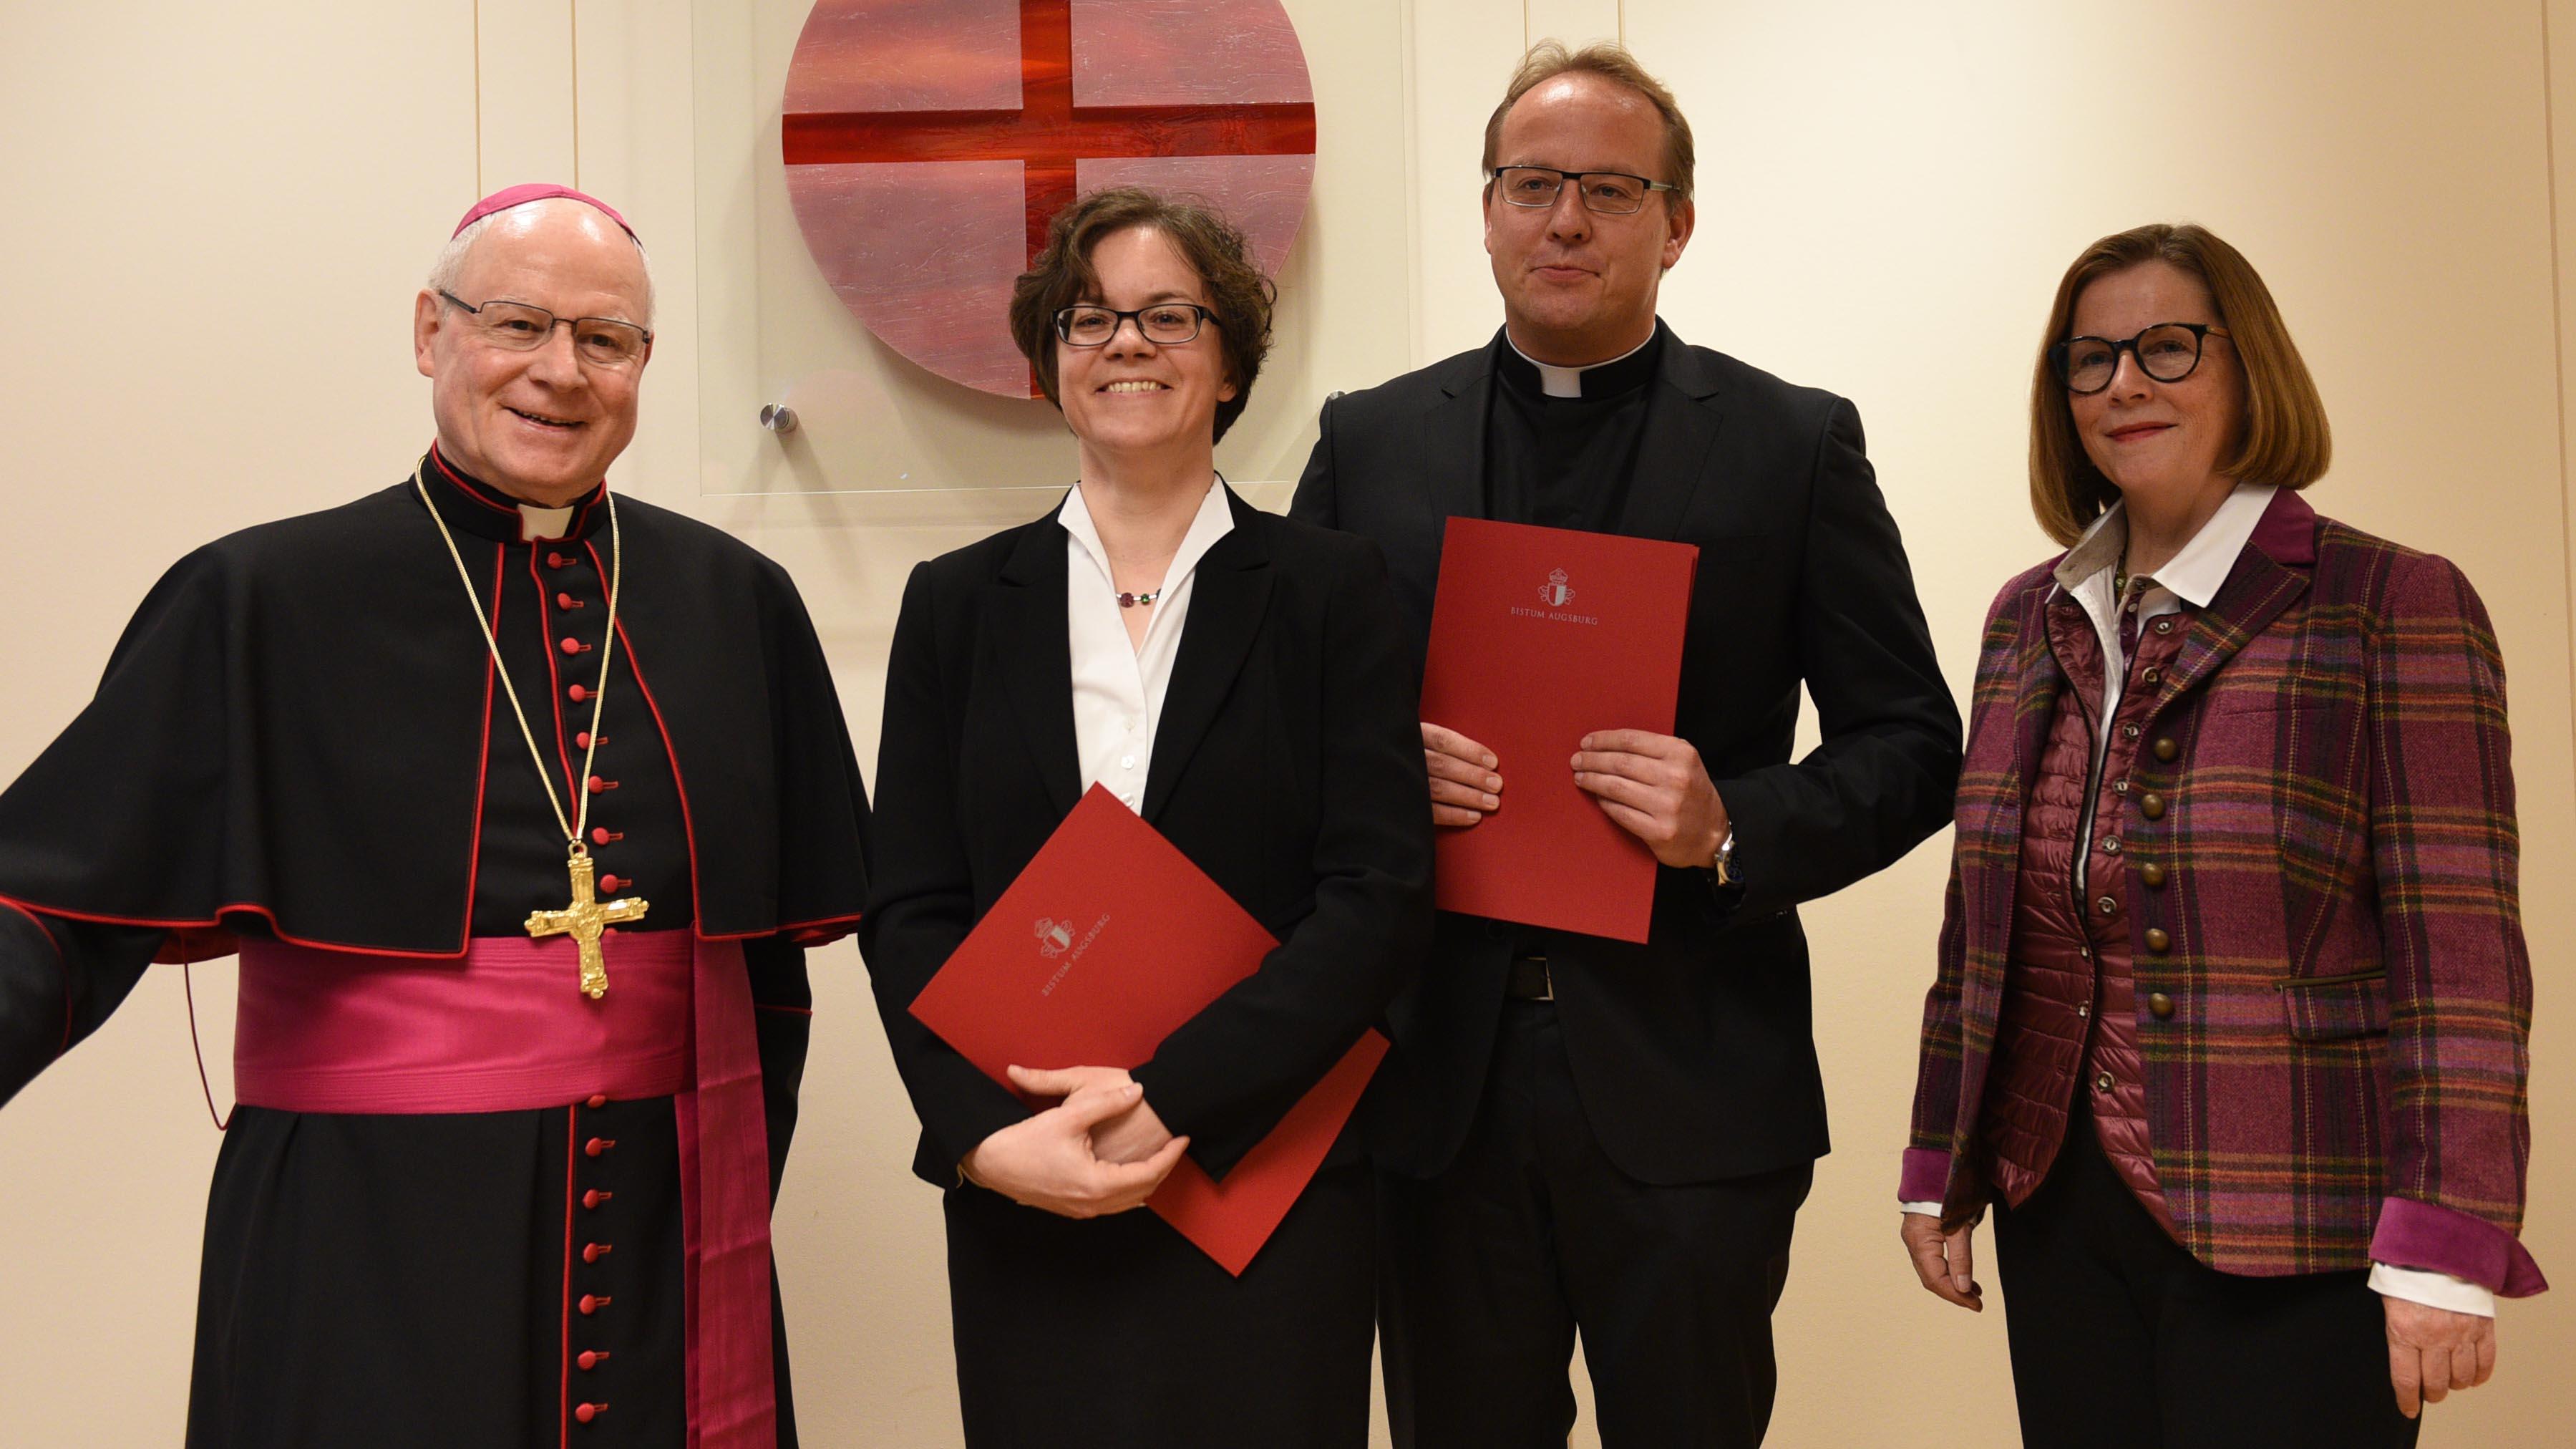 Von links: Bischof Dr. Konrad Zdarsa, Dr. Carolin Neuber, Dr. Andreas Jall, Prof. Dr. Gerda Riedl (Fotos: Maria Steber / pba).